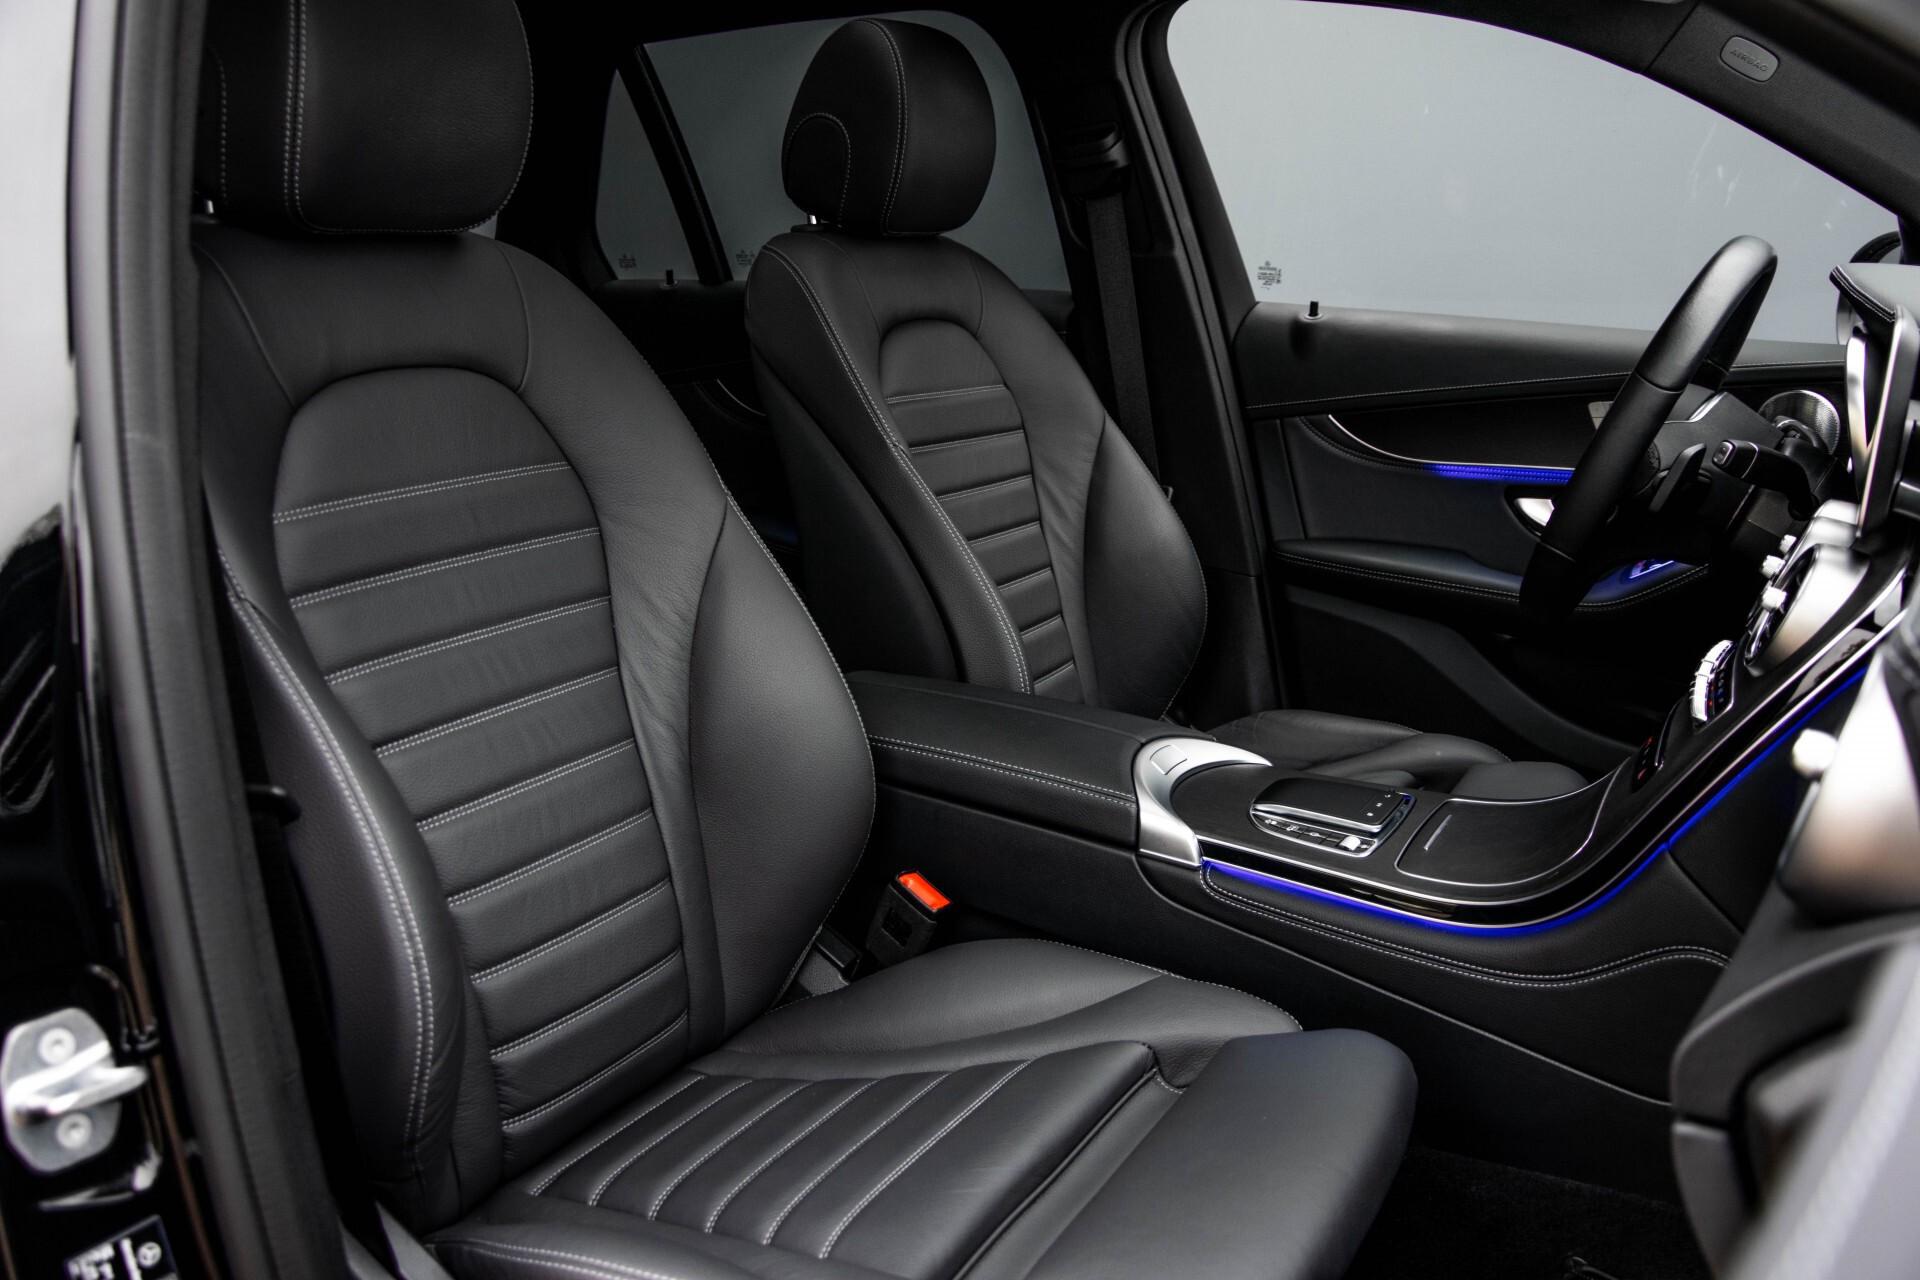 Mercedes-Benz GLC 200 4-M AMG Night/Panorama/Distronic Pro/Burmester/360camera/Exclusive Aut9 Foto 3